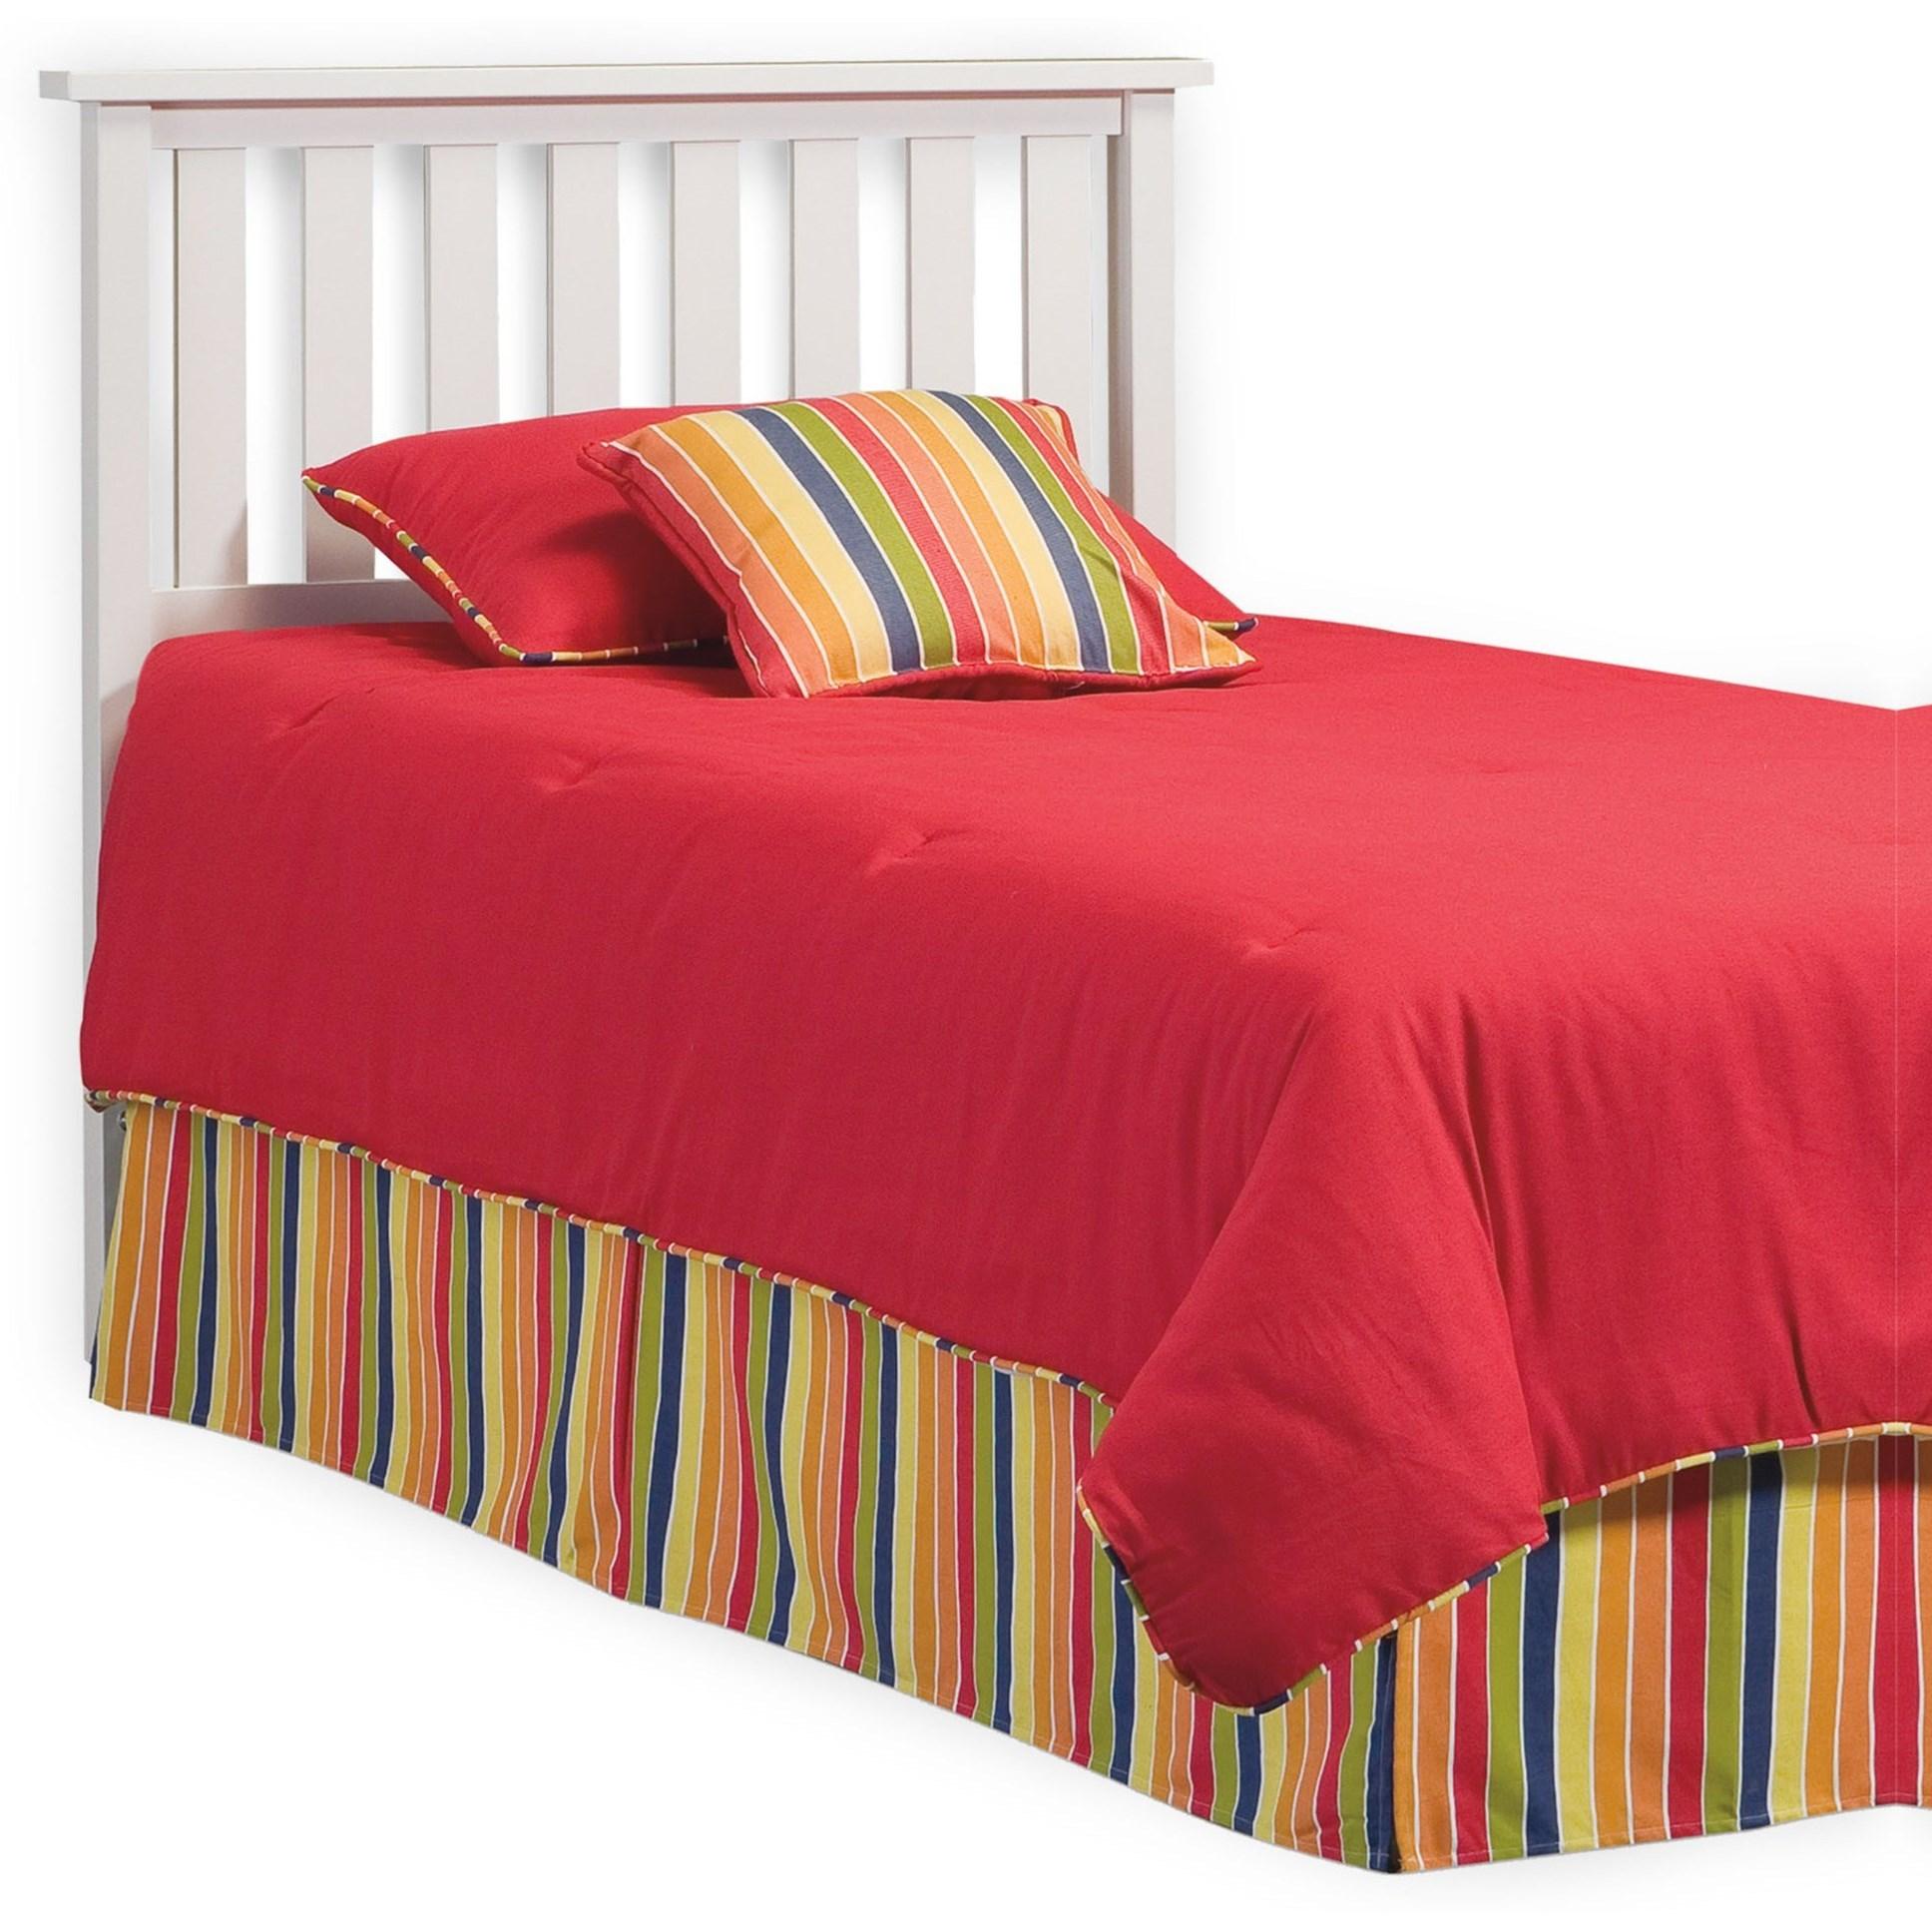 0d2237431 Fashion bed group belmont headboard